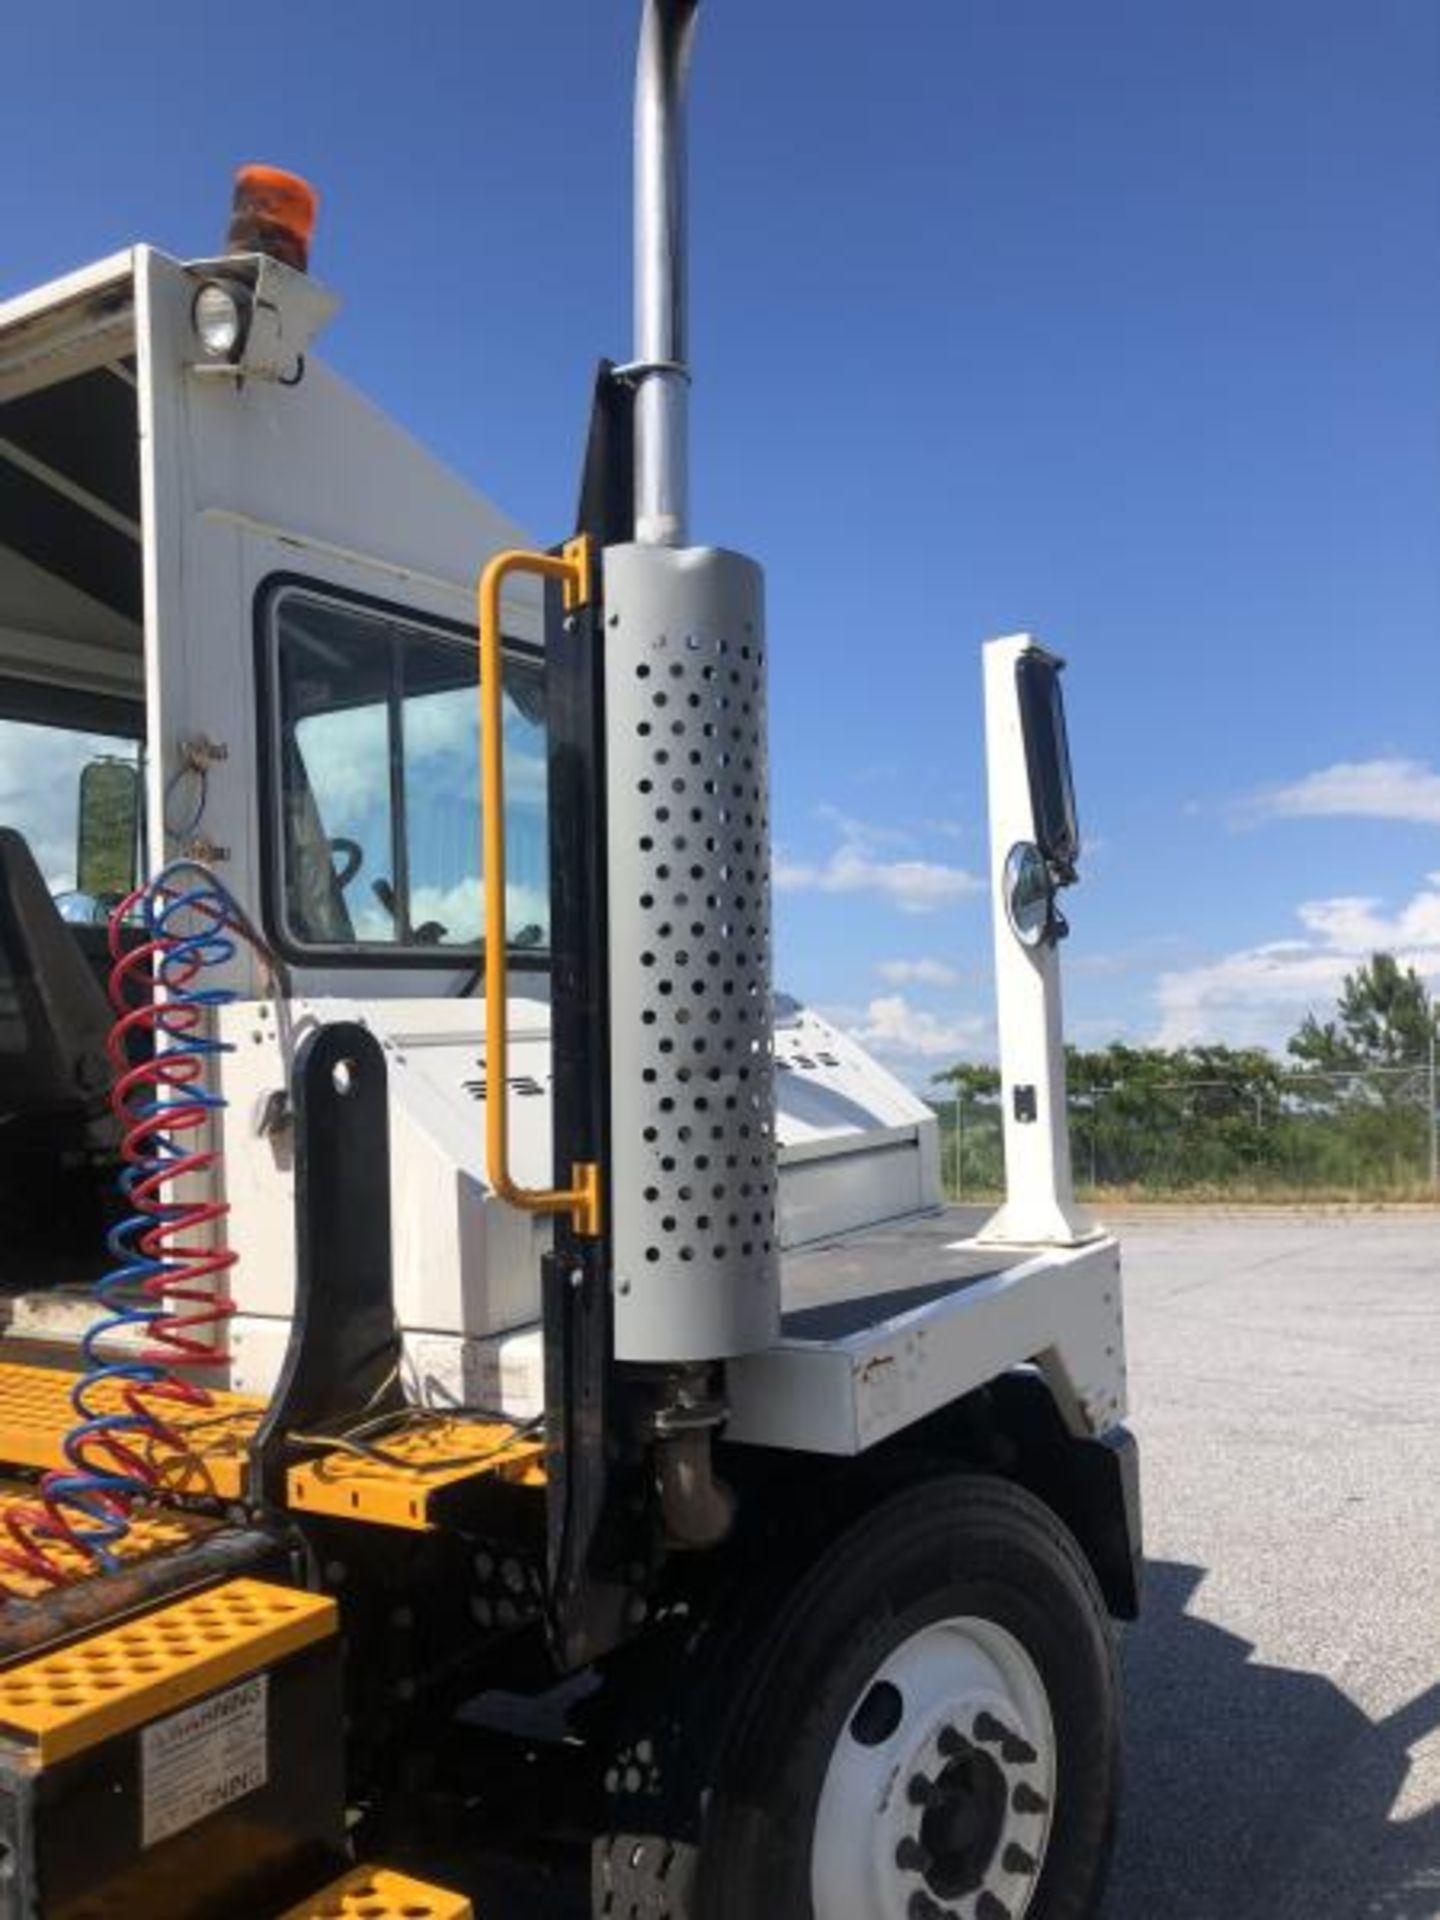 2015 Kalmar Ottawa 4x2 Yard Truck , SN: 338836 1,939.0 Hours, 1,961 Miles - Image 14 of 33